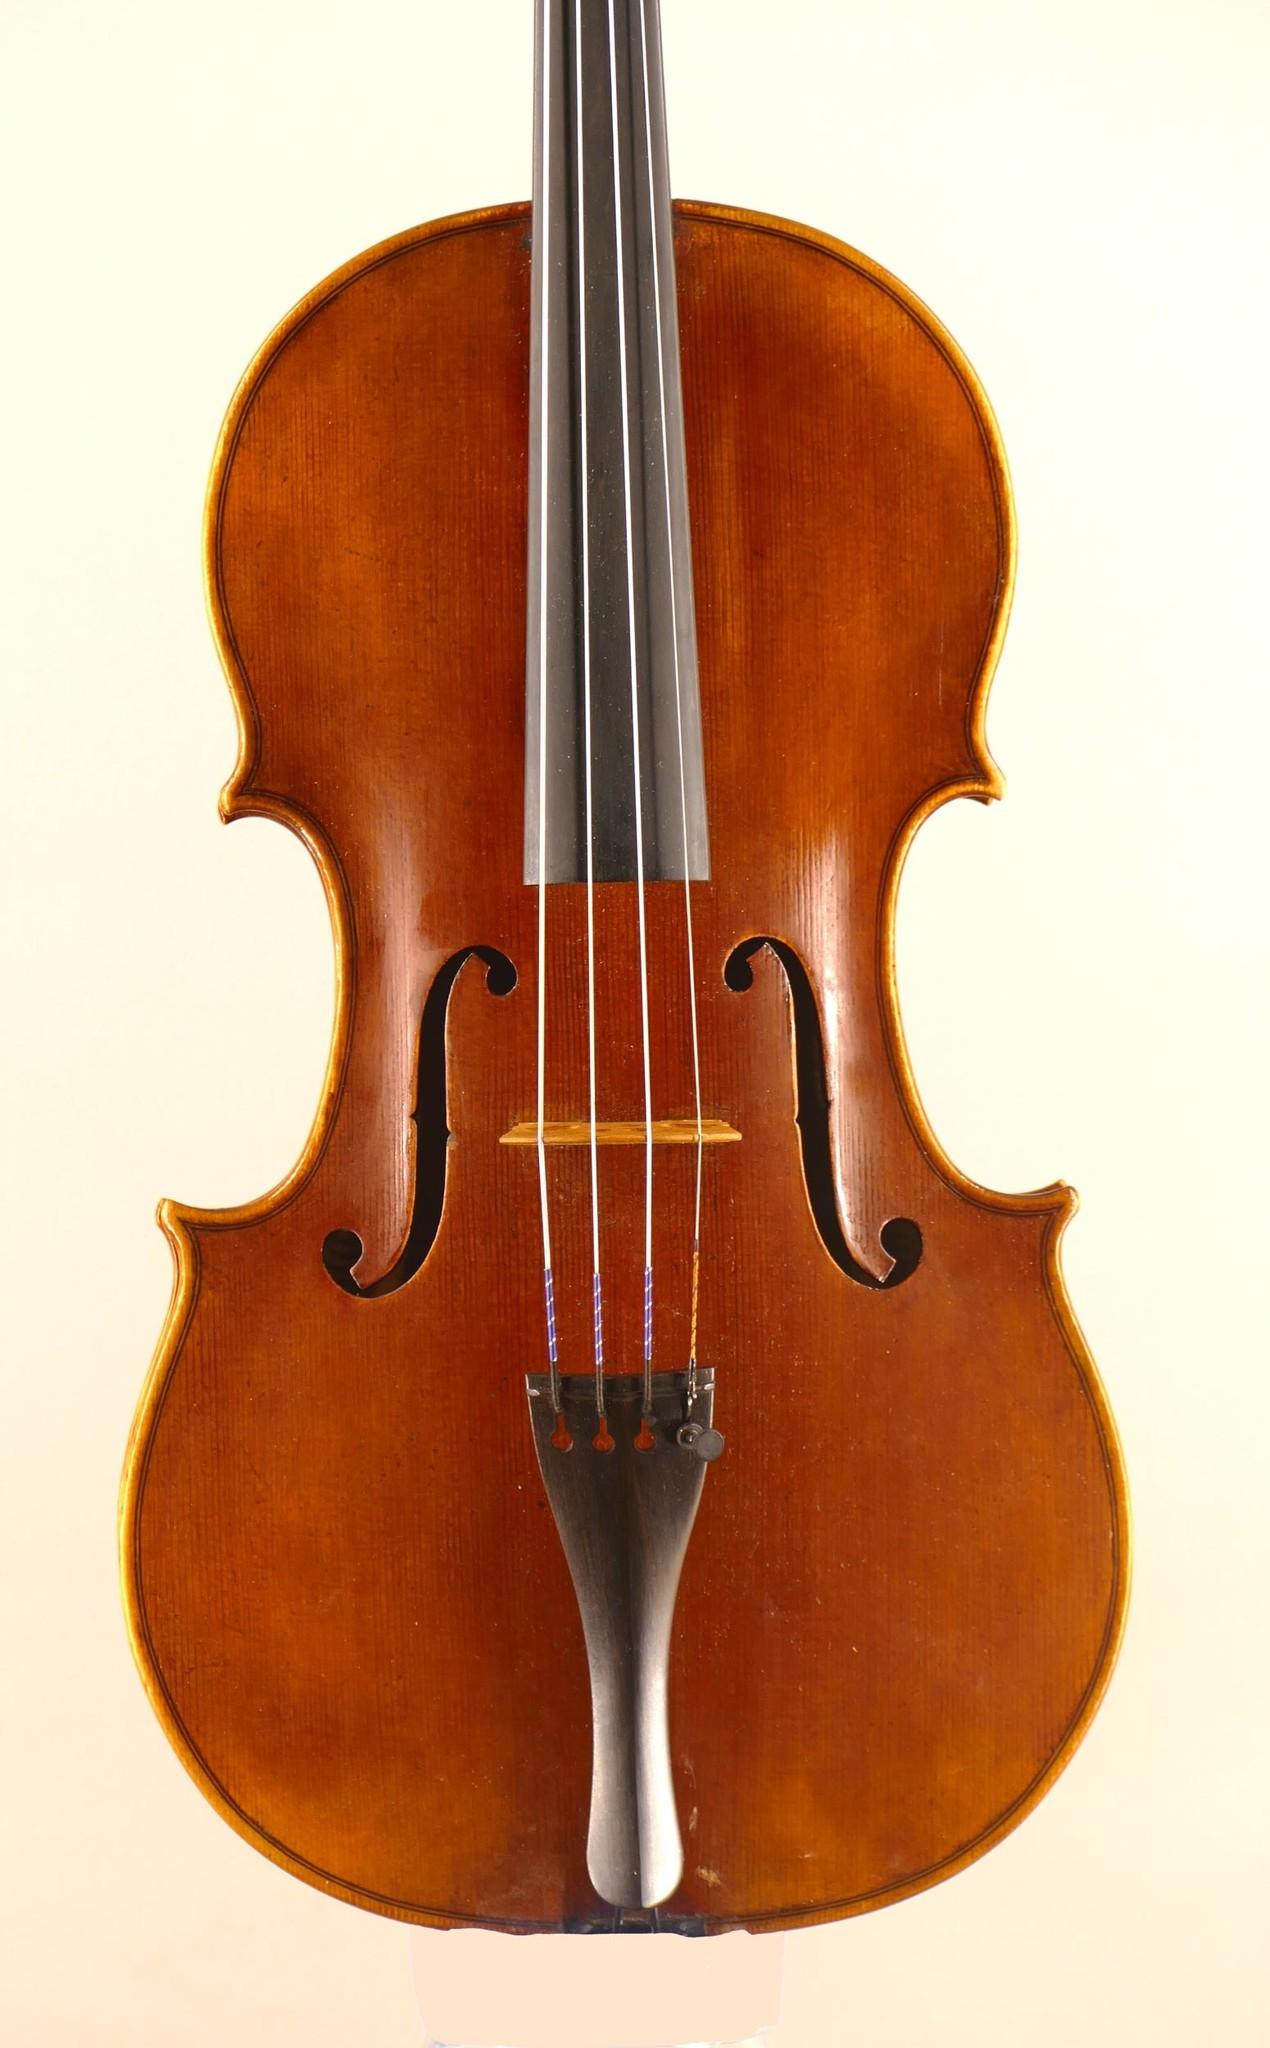 "Andrew Carruthers, 2020, 16.5"" viola, 2031, Santa Rosa, CA"